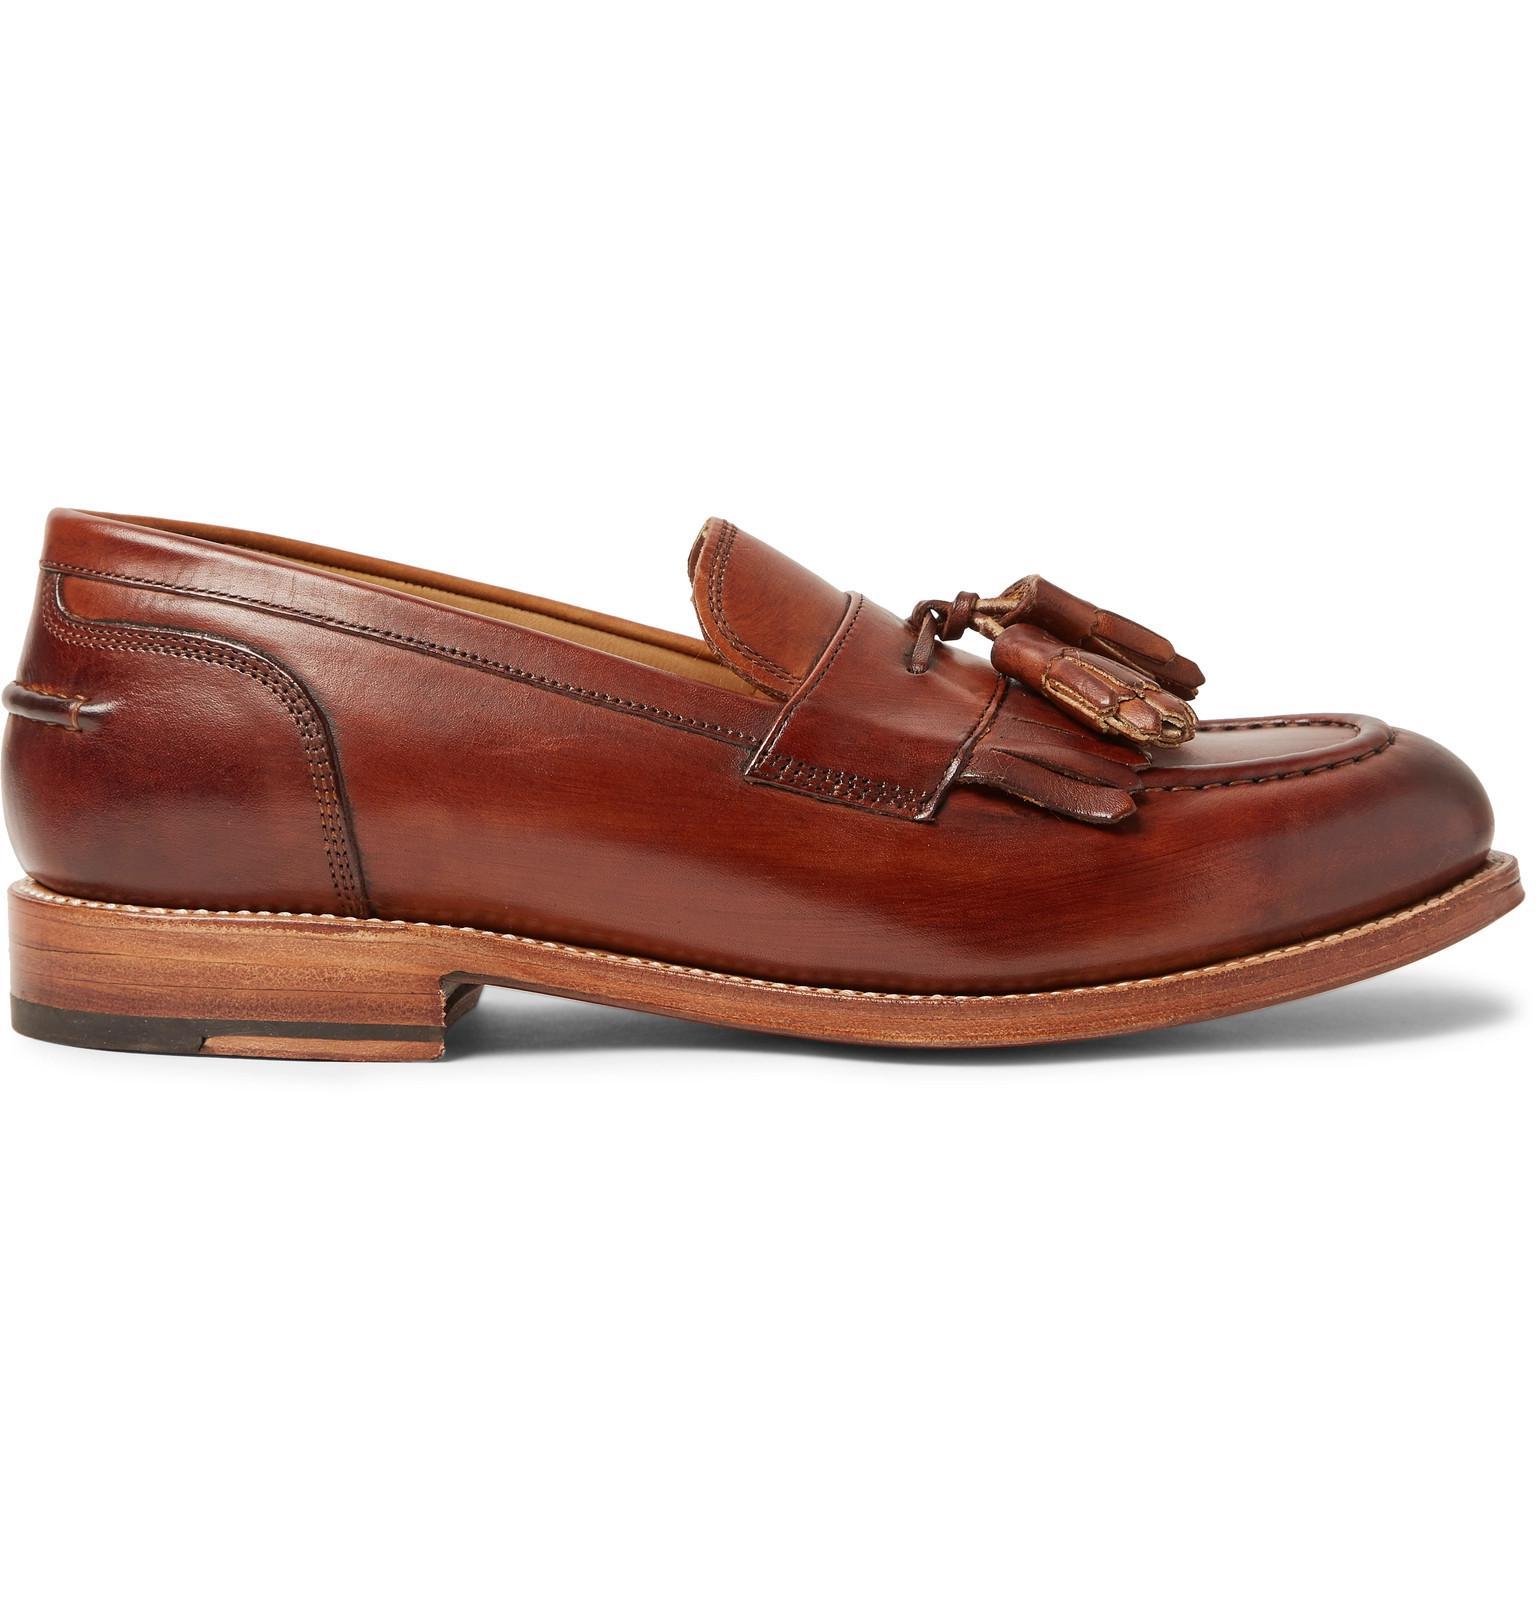 68bb34920ee Lyst - Grenson Mackenzie Burnished-leather Tasselled Kiltie Loafers ...